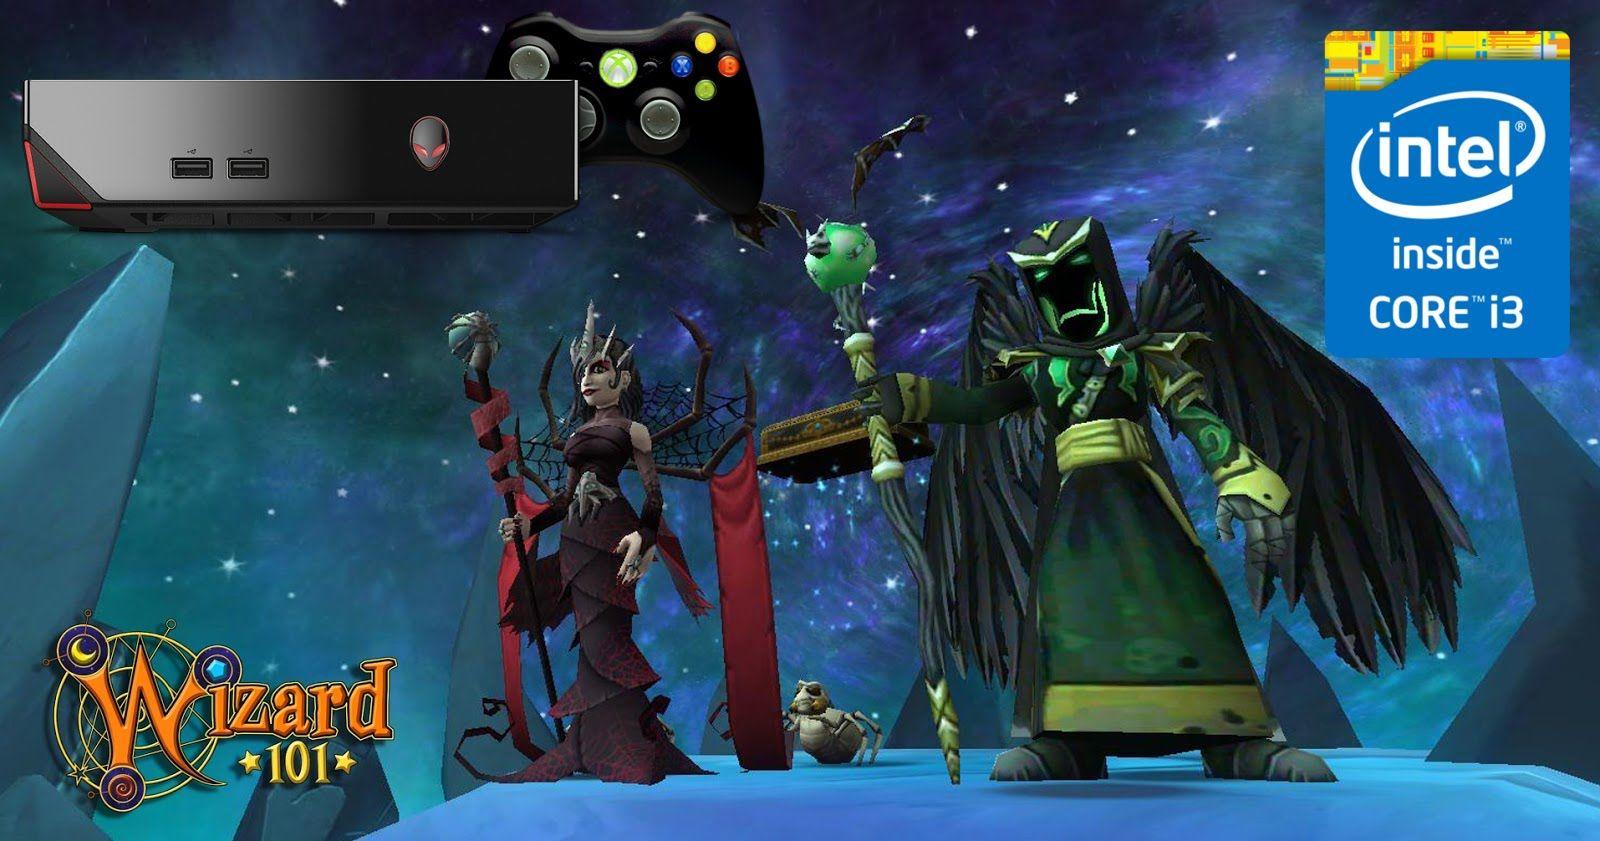 Wizard101 #MMORPG by KingsIsle on #Alienware Alpha i3 Ultra